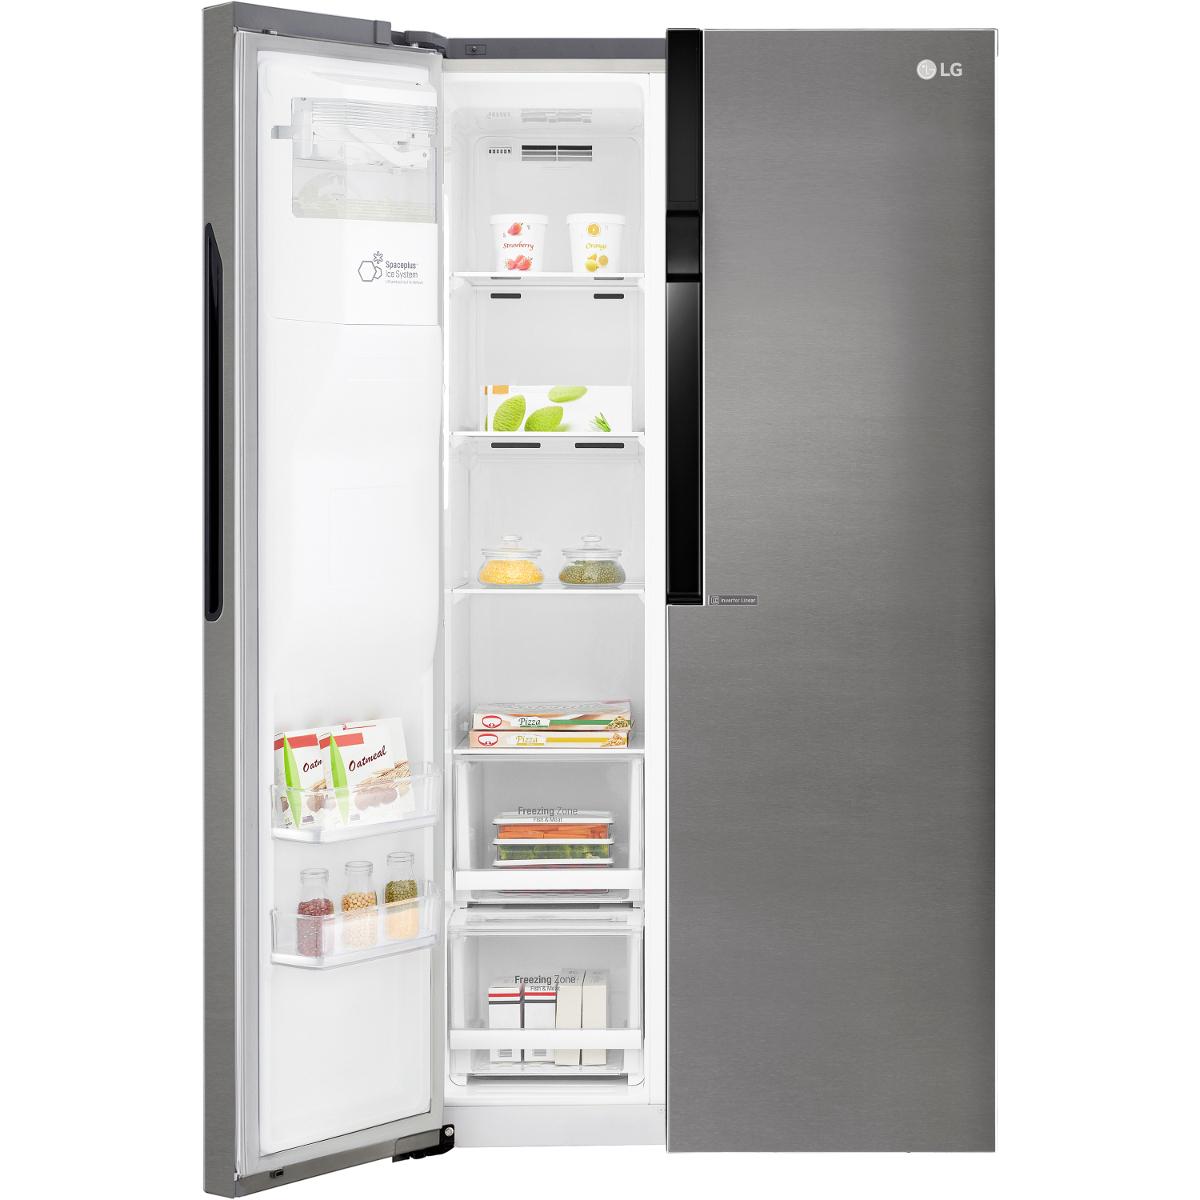 LG GSL361ICEZ American Style Frost Free Fridge Freezer | Discount ...